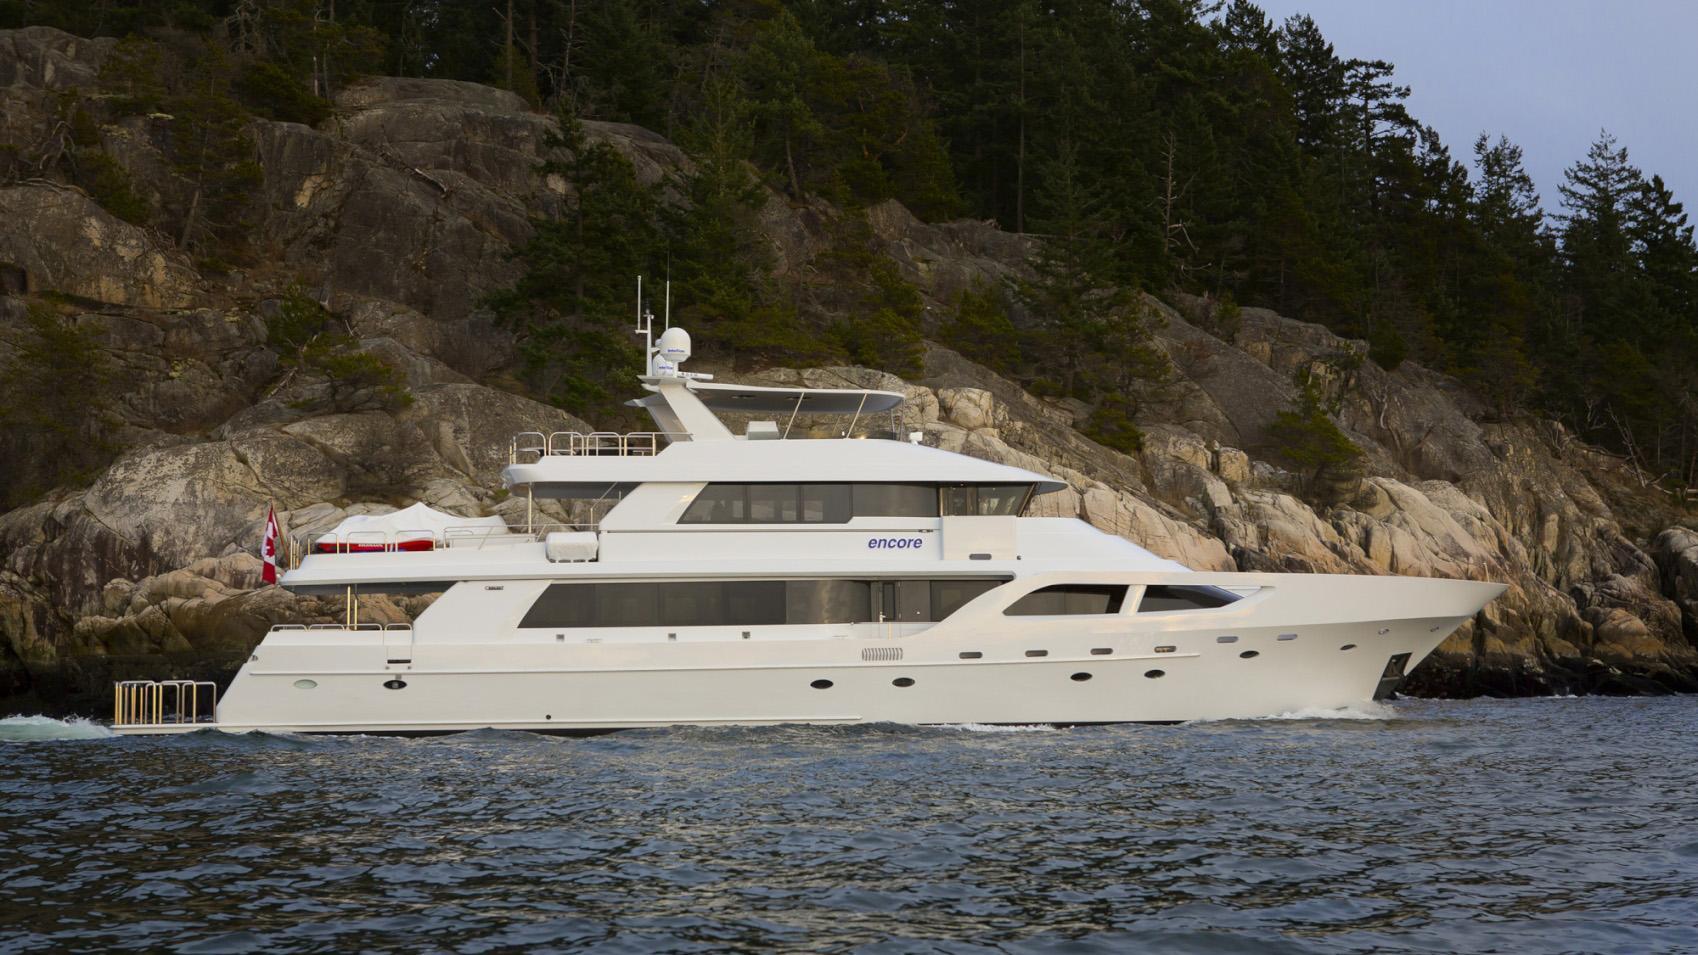 Encore motor yacht for sale full profile